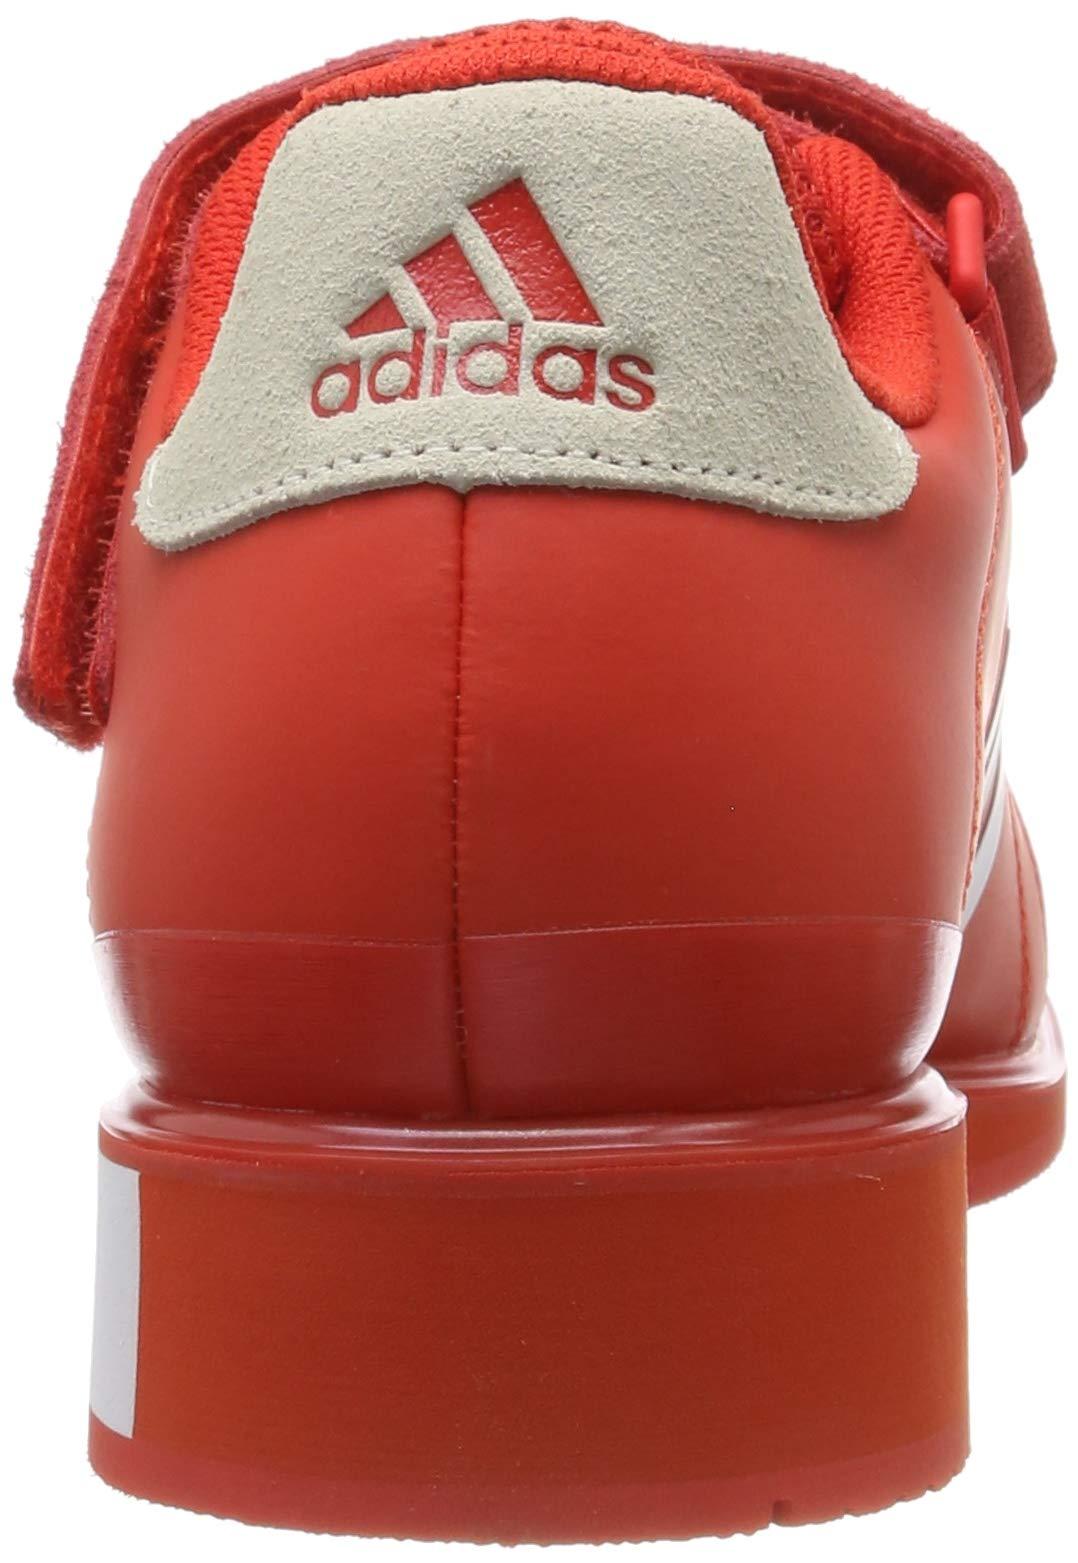 adidas Power Perfect III, Scarpe da Fitness Uomo 2 spesavip